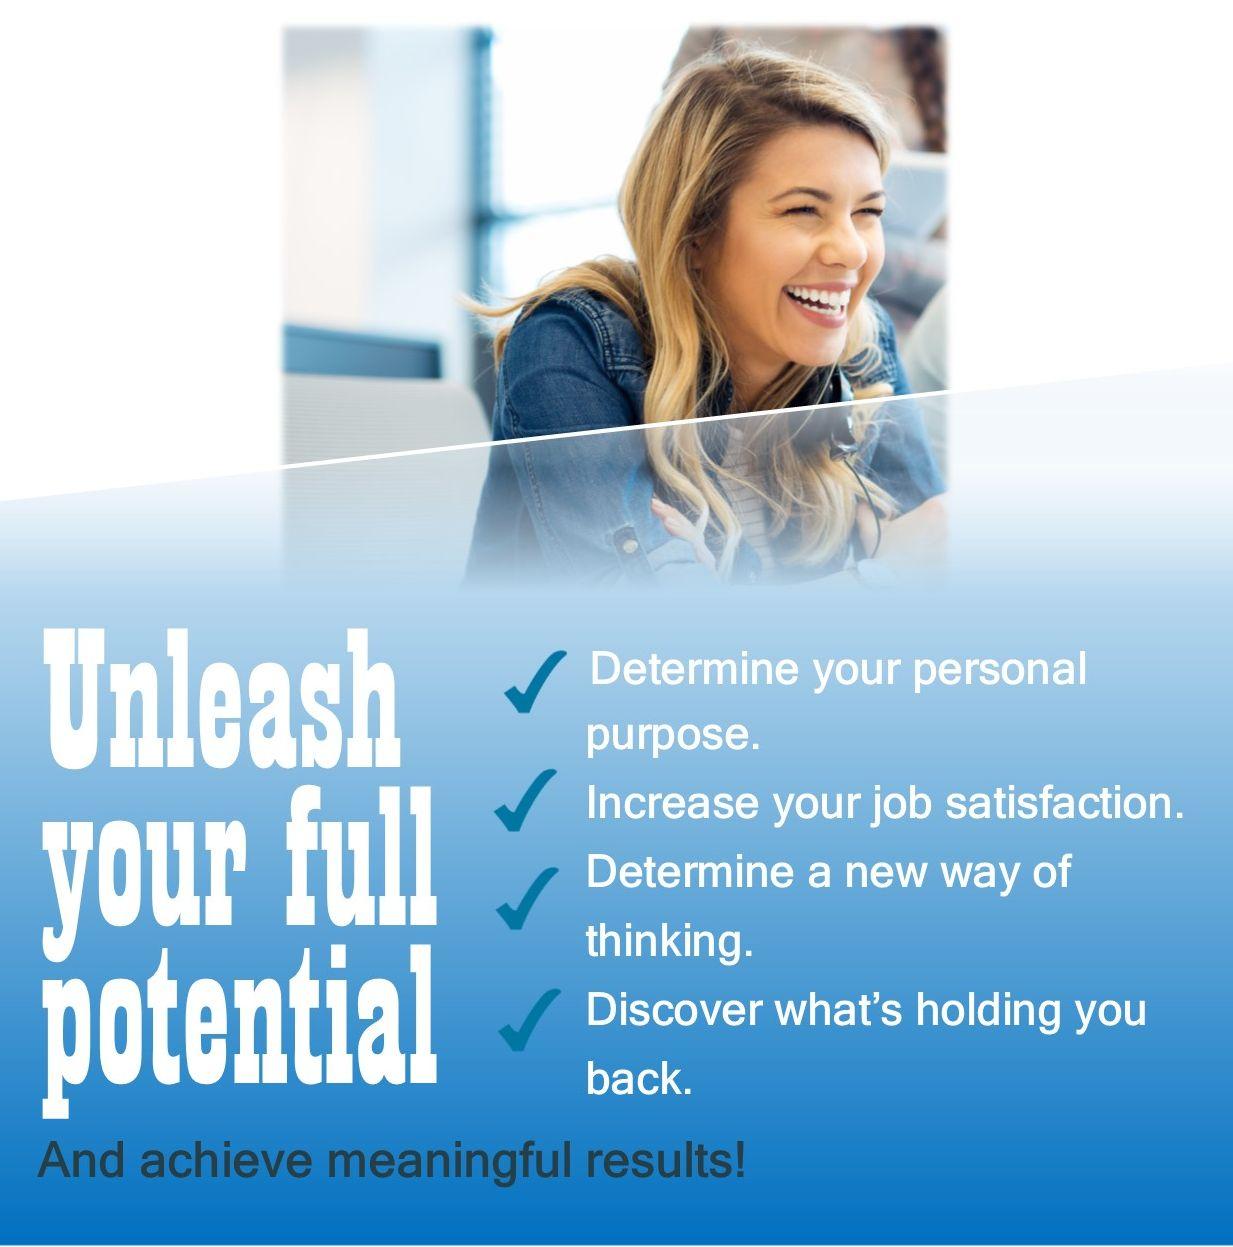 Unleash Your Full Potential Flyercut.jpg